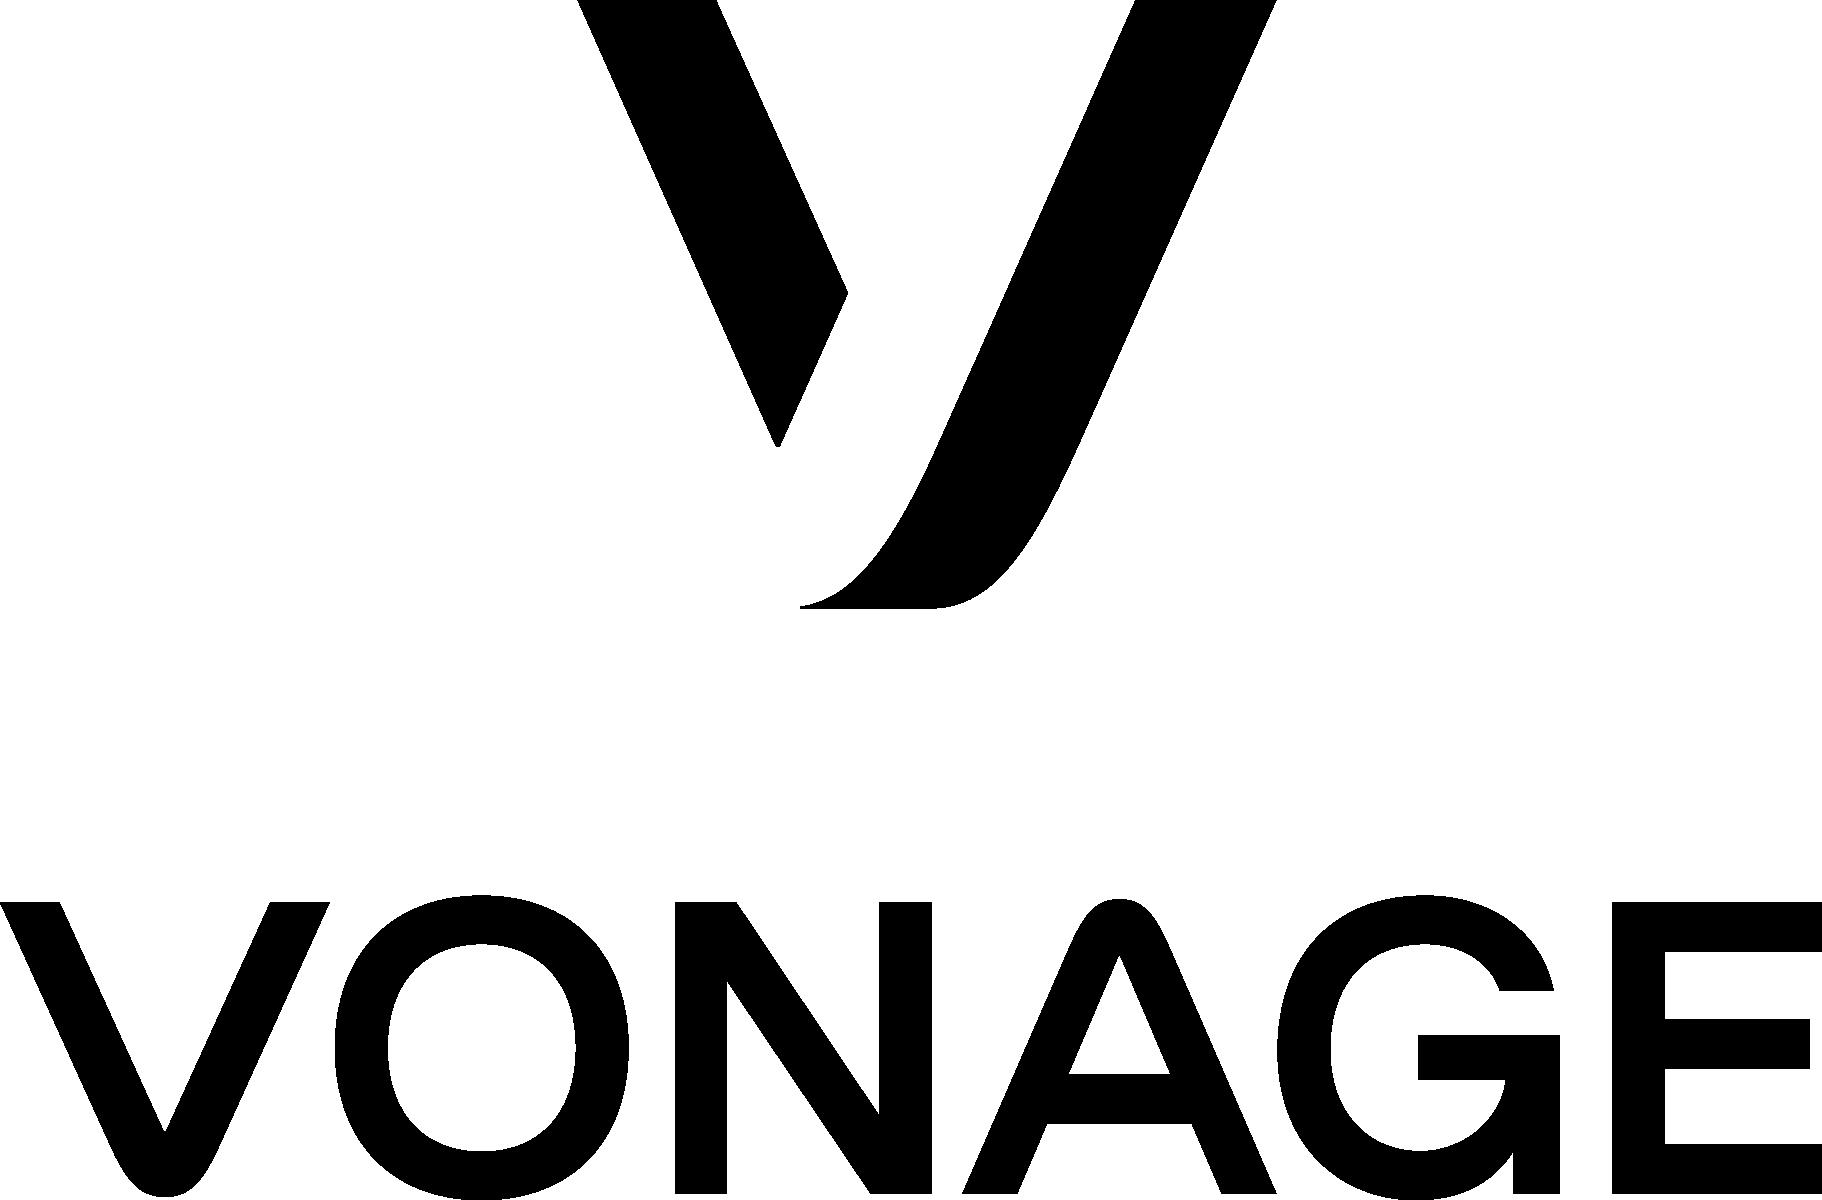 Vonage Business Communications logo